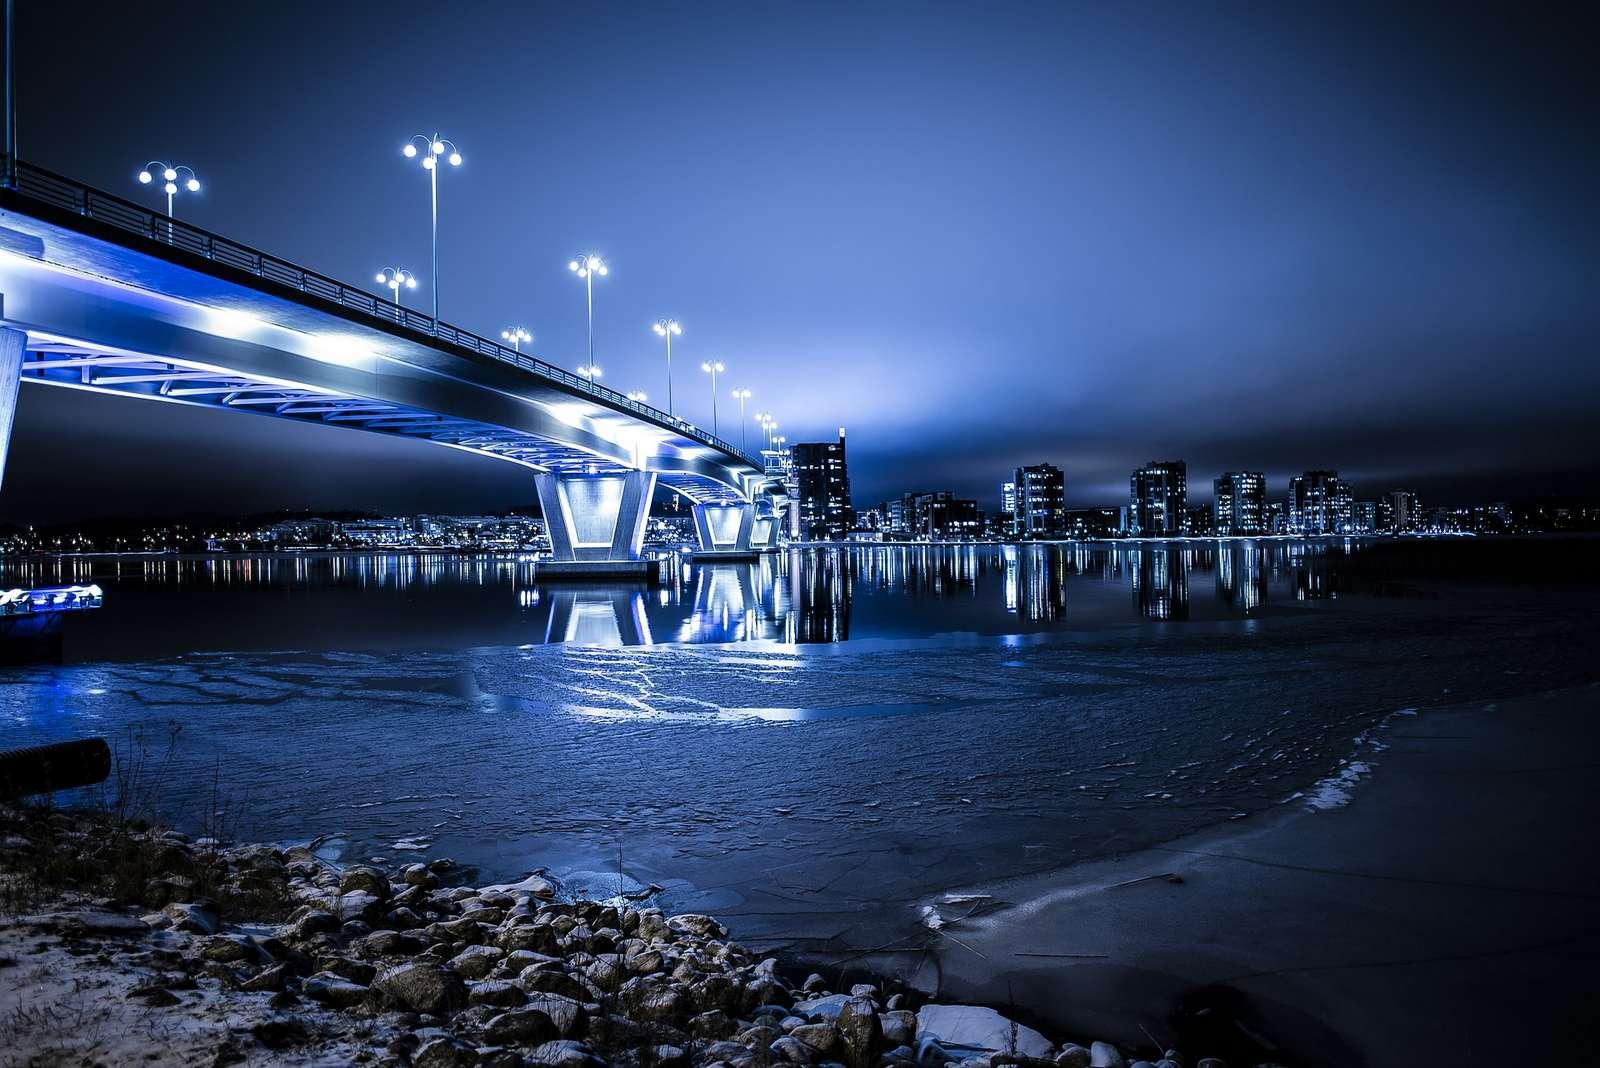 Smart Lightning Bild 1 Lit Bridge